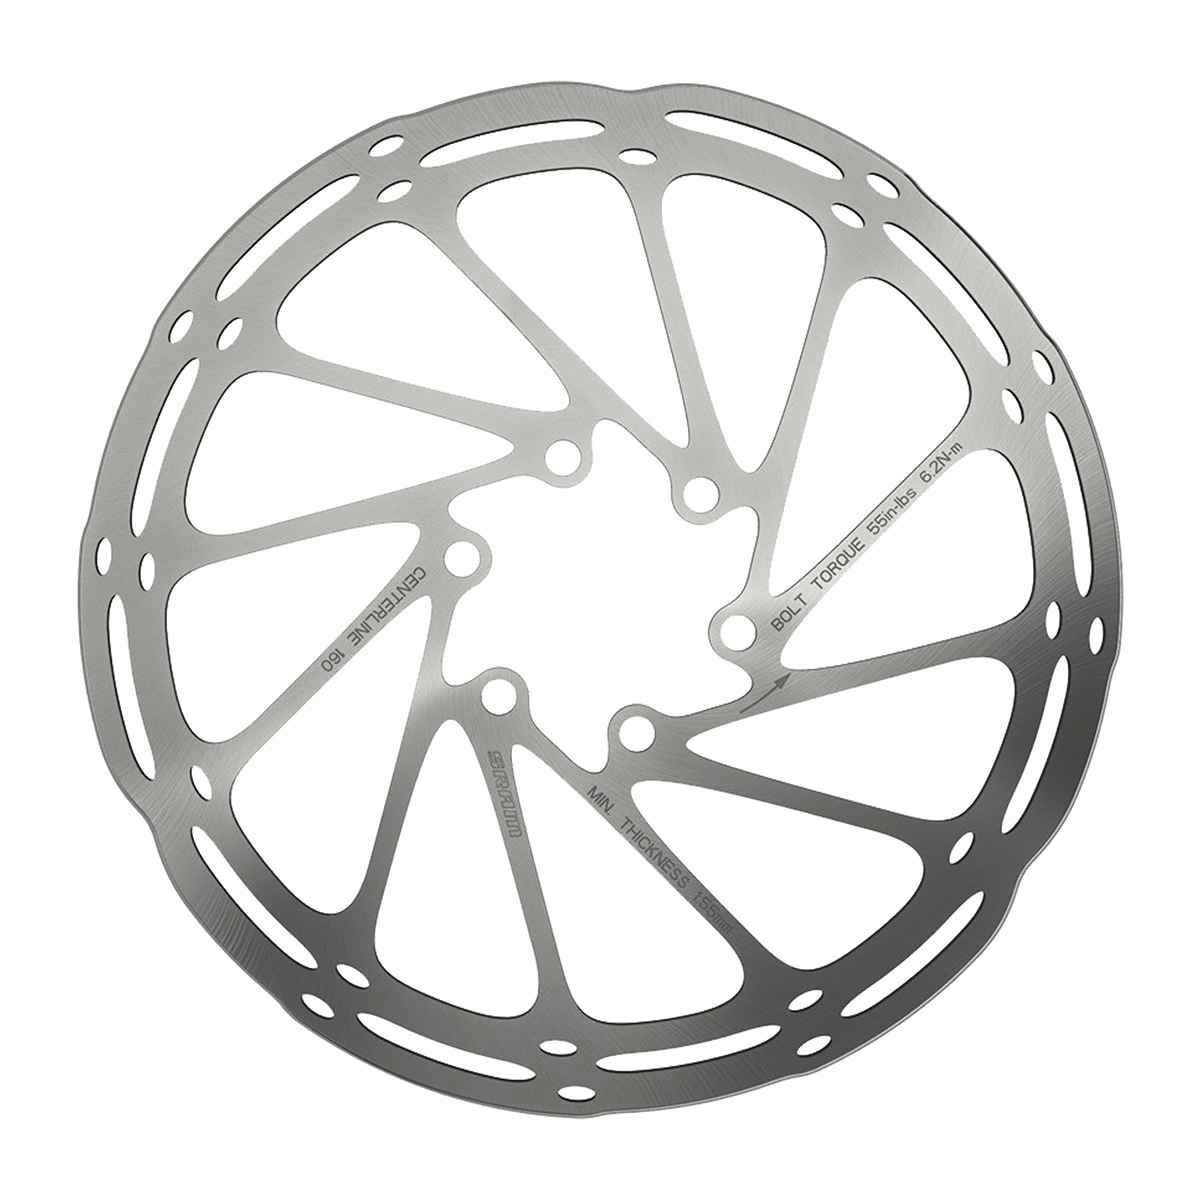 Ротор (Avid) Sram Centerline 160 мм